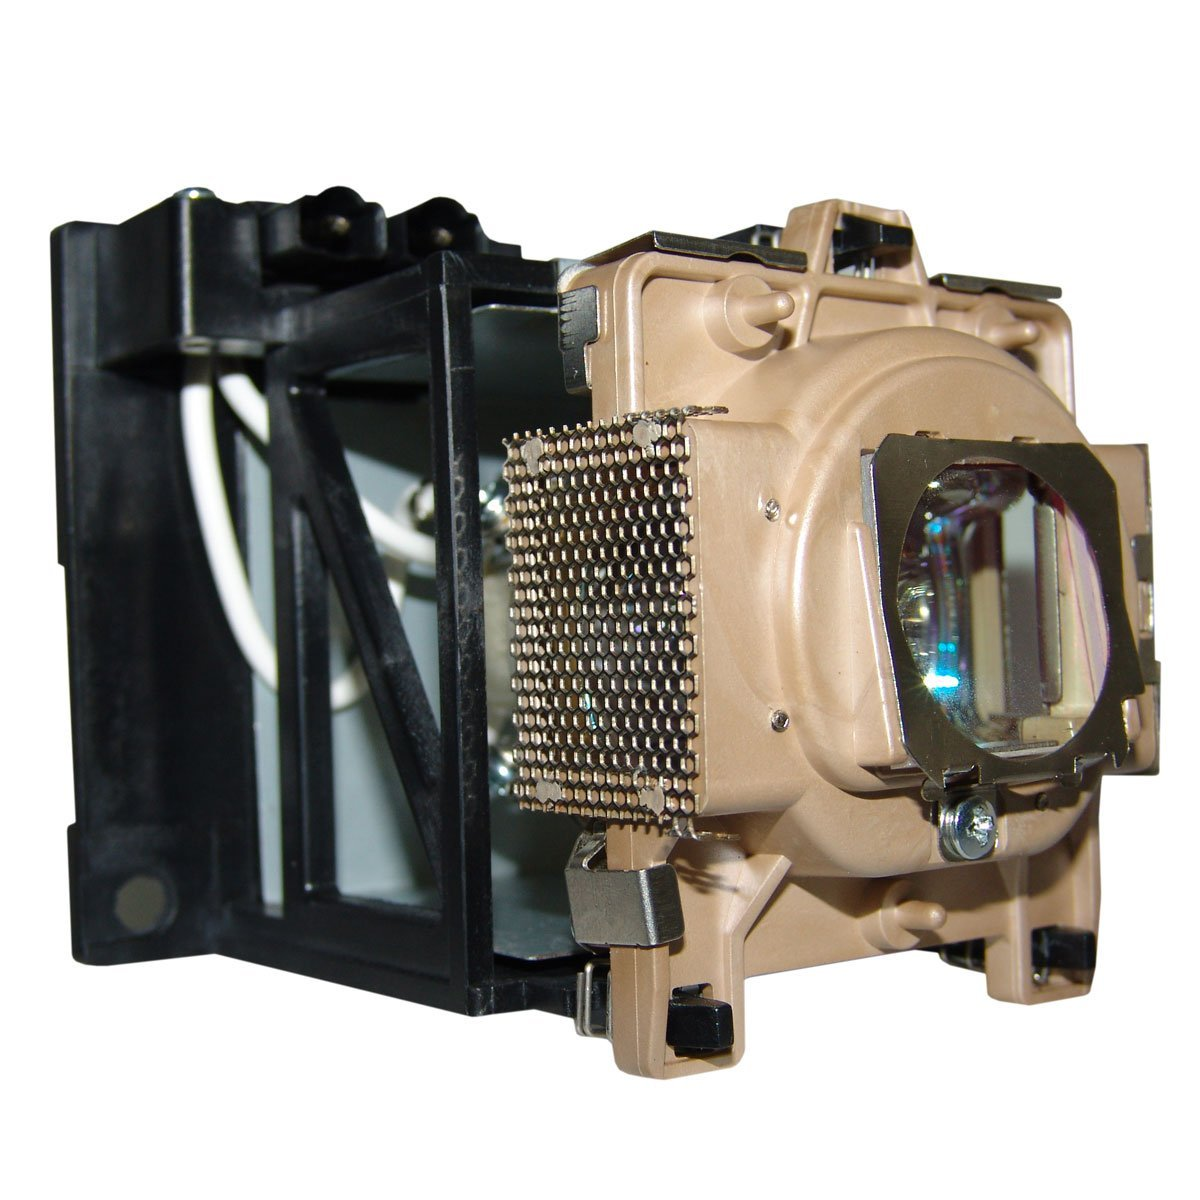 59.J0B01.CG1 for BenQ PE8720 W10000 W9000 Projector Lamp Bulb with housing original projector lamp bulb 59 j0b01 cg1 for benq pe8720 w10000 w9000 projectors